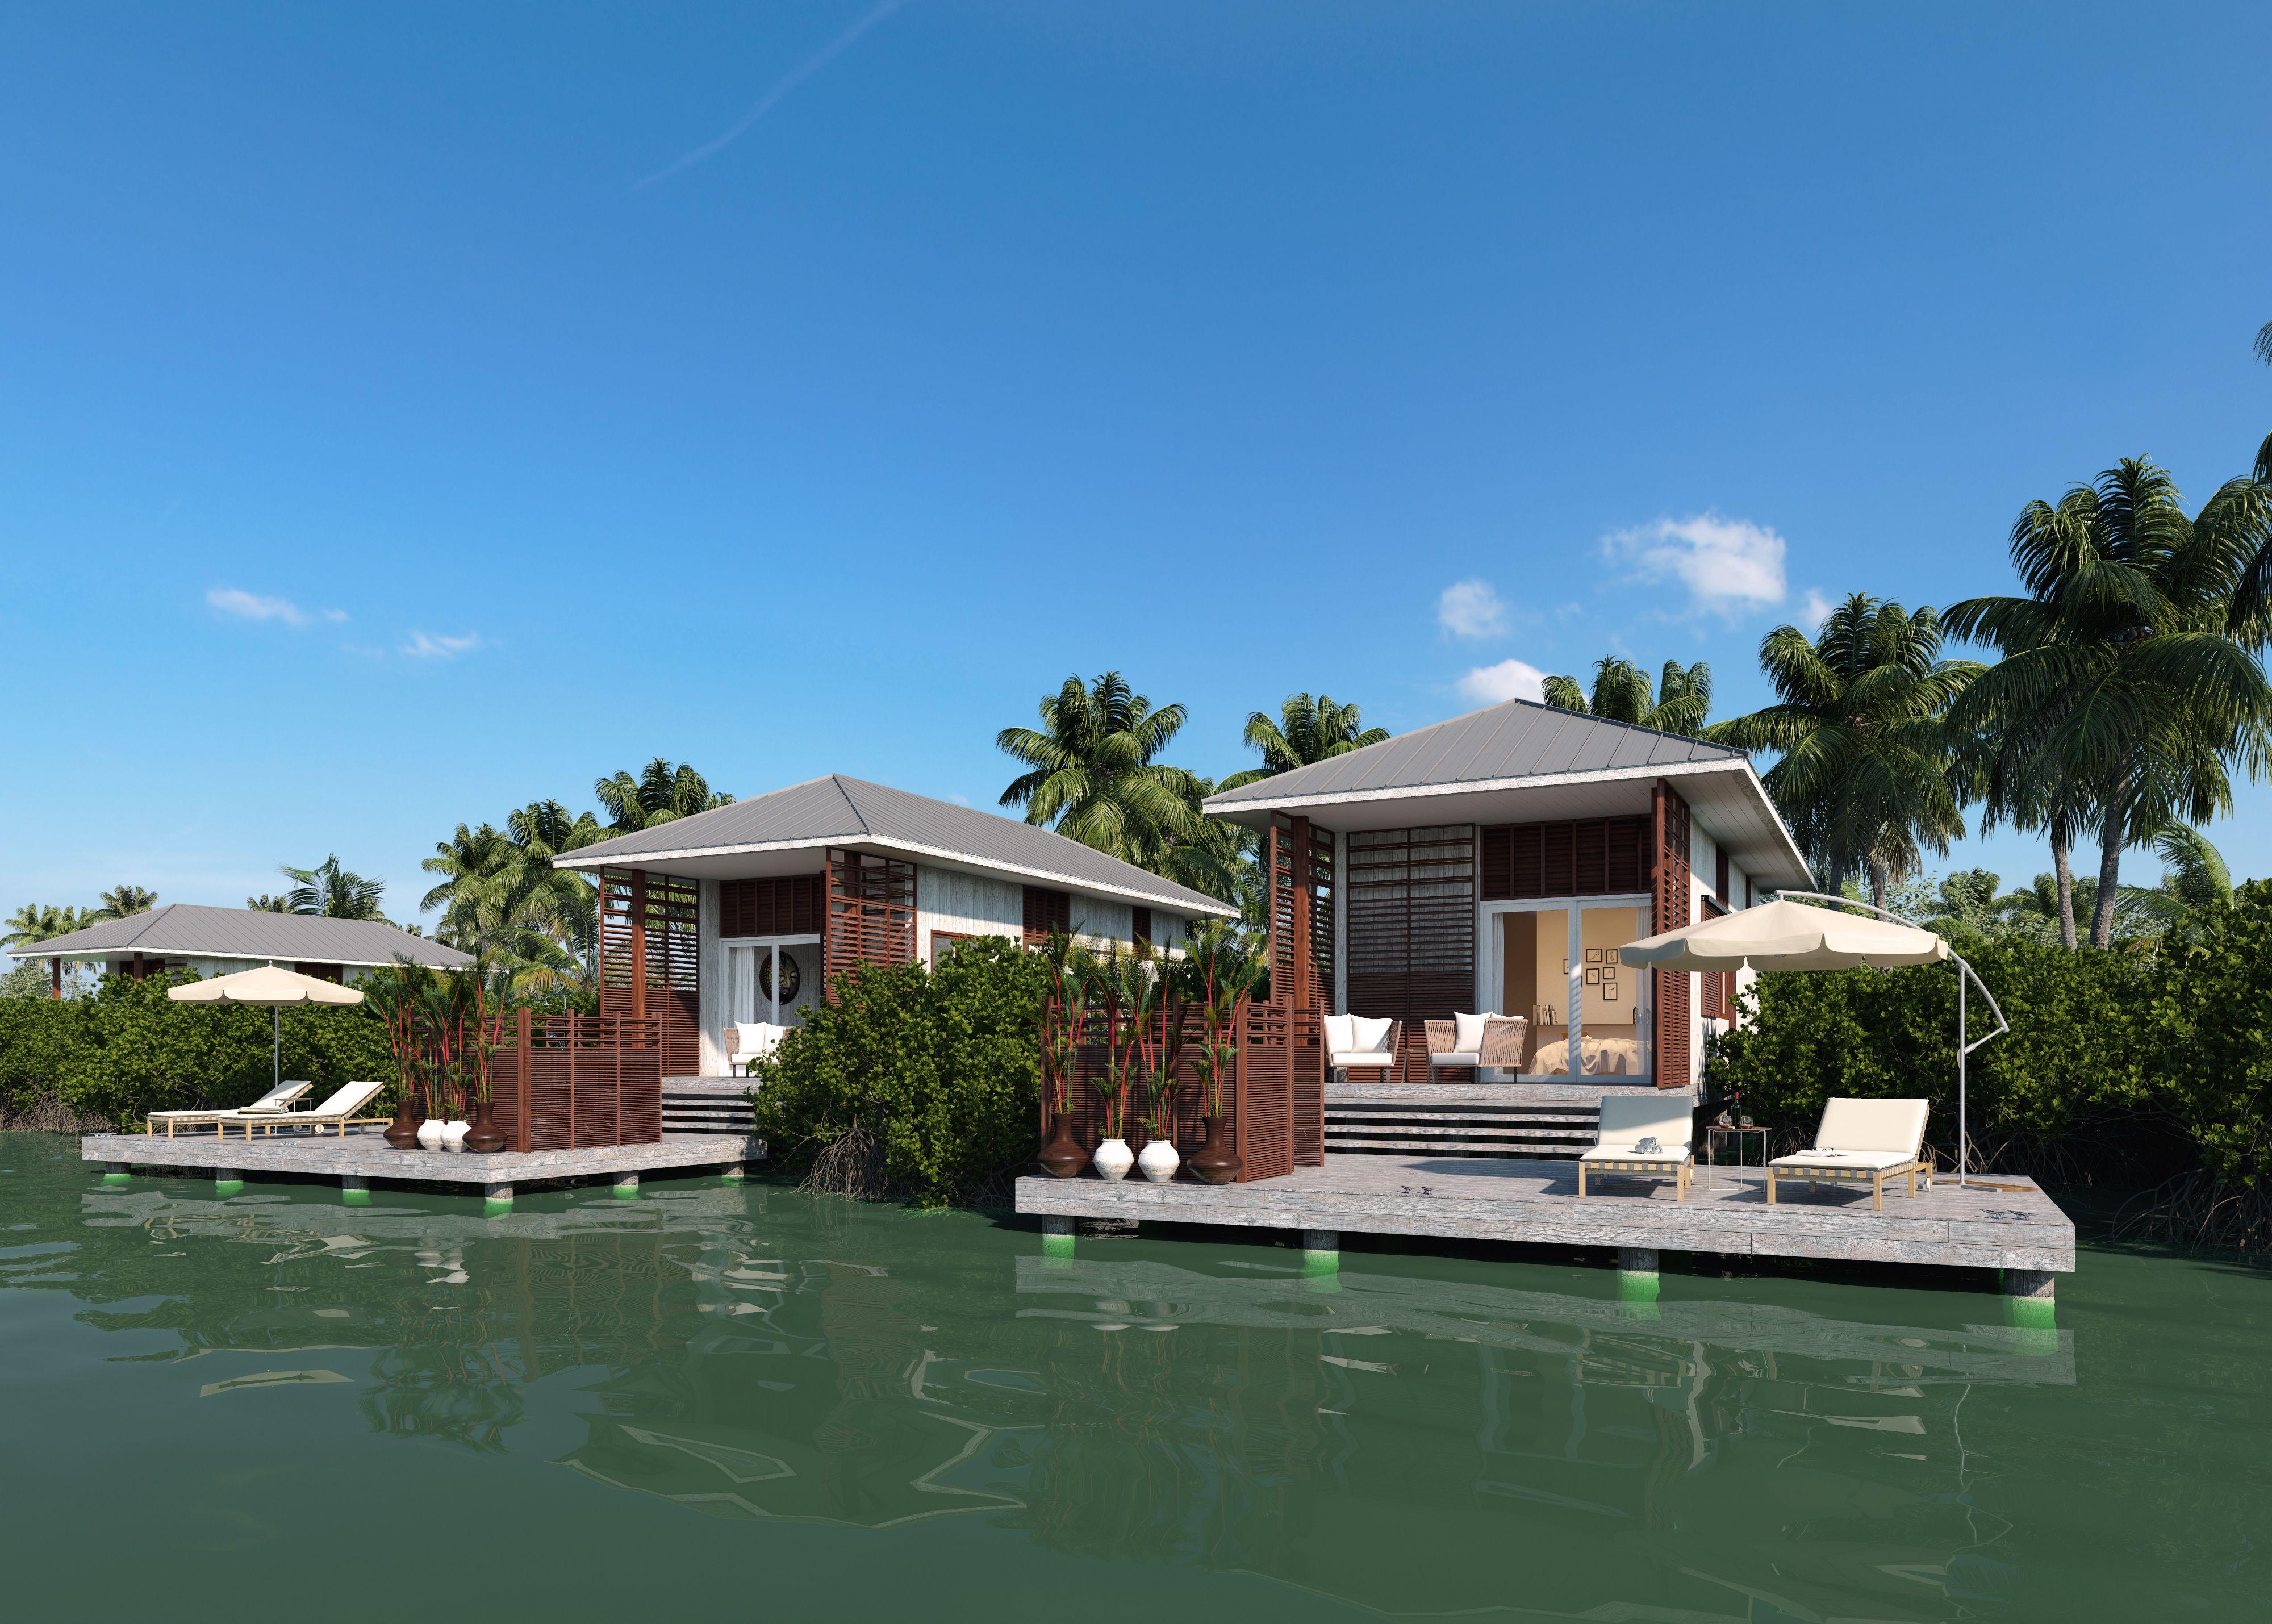 A private luxury oasis. | #Itzana #luxuryresort #Belize